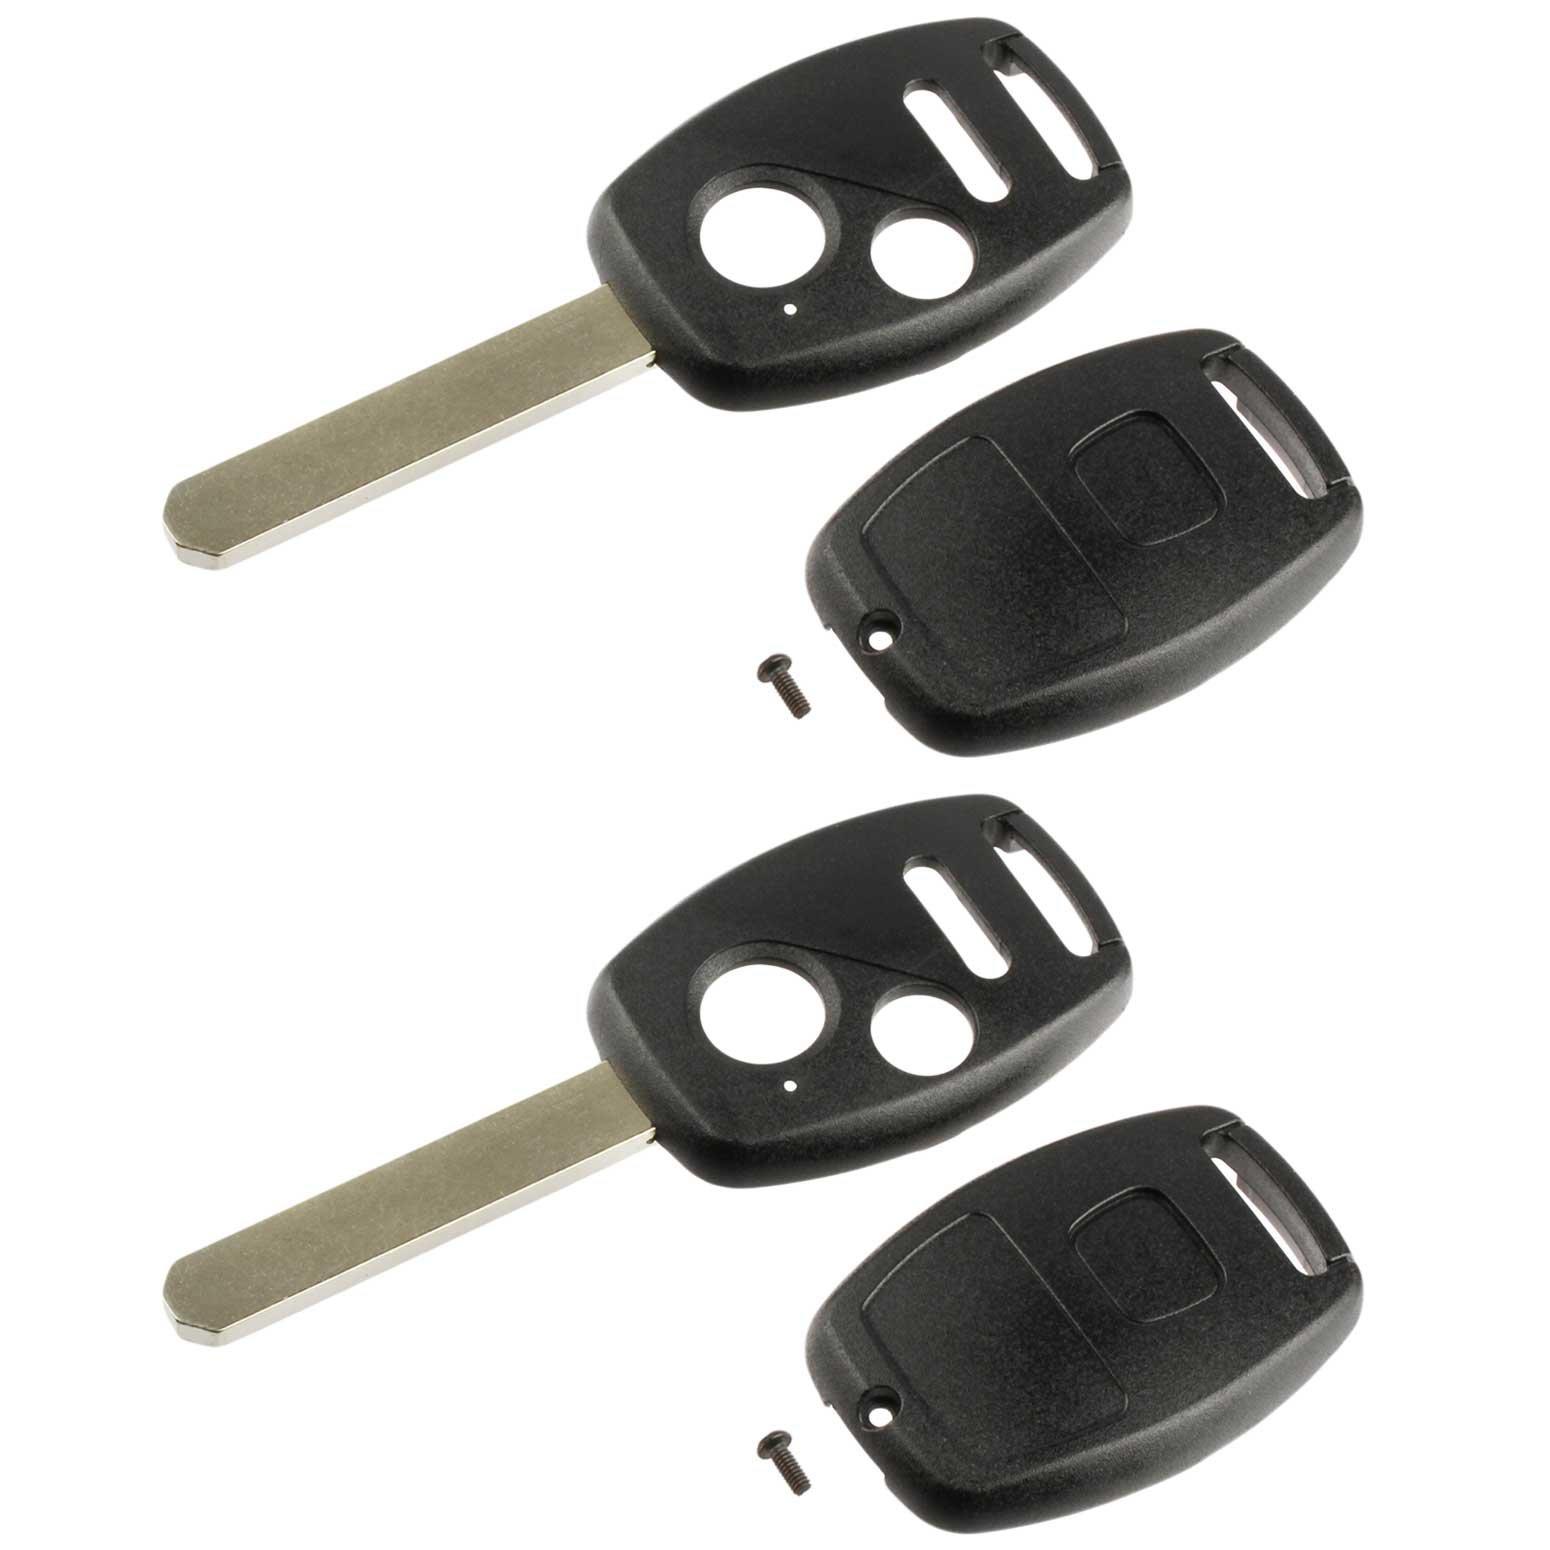 Key Fob Keyless Entry Remote Shell Case & Pad fits Honda 2007-2008 Fit / 2005-2010 Odyssey / 2005-2008 Pilot / 2006-2014 Ridgeline, Set of 2